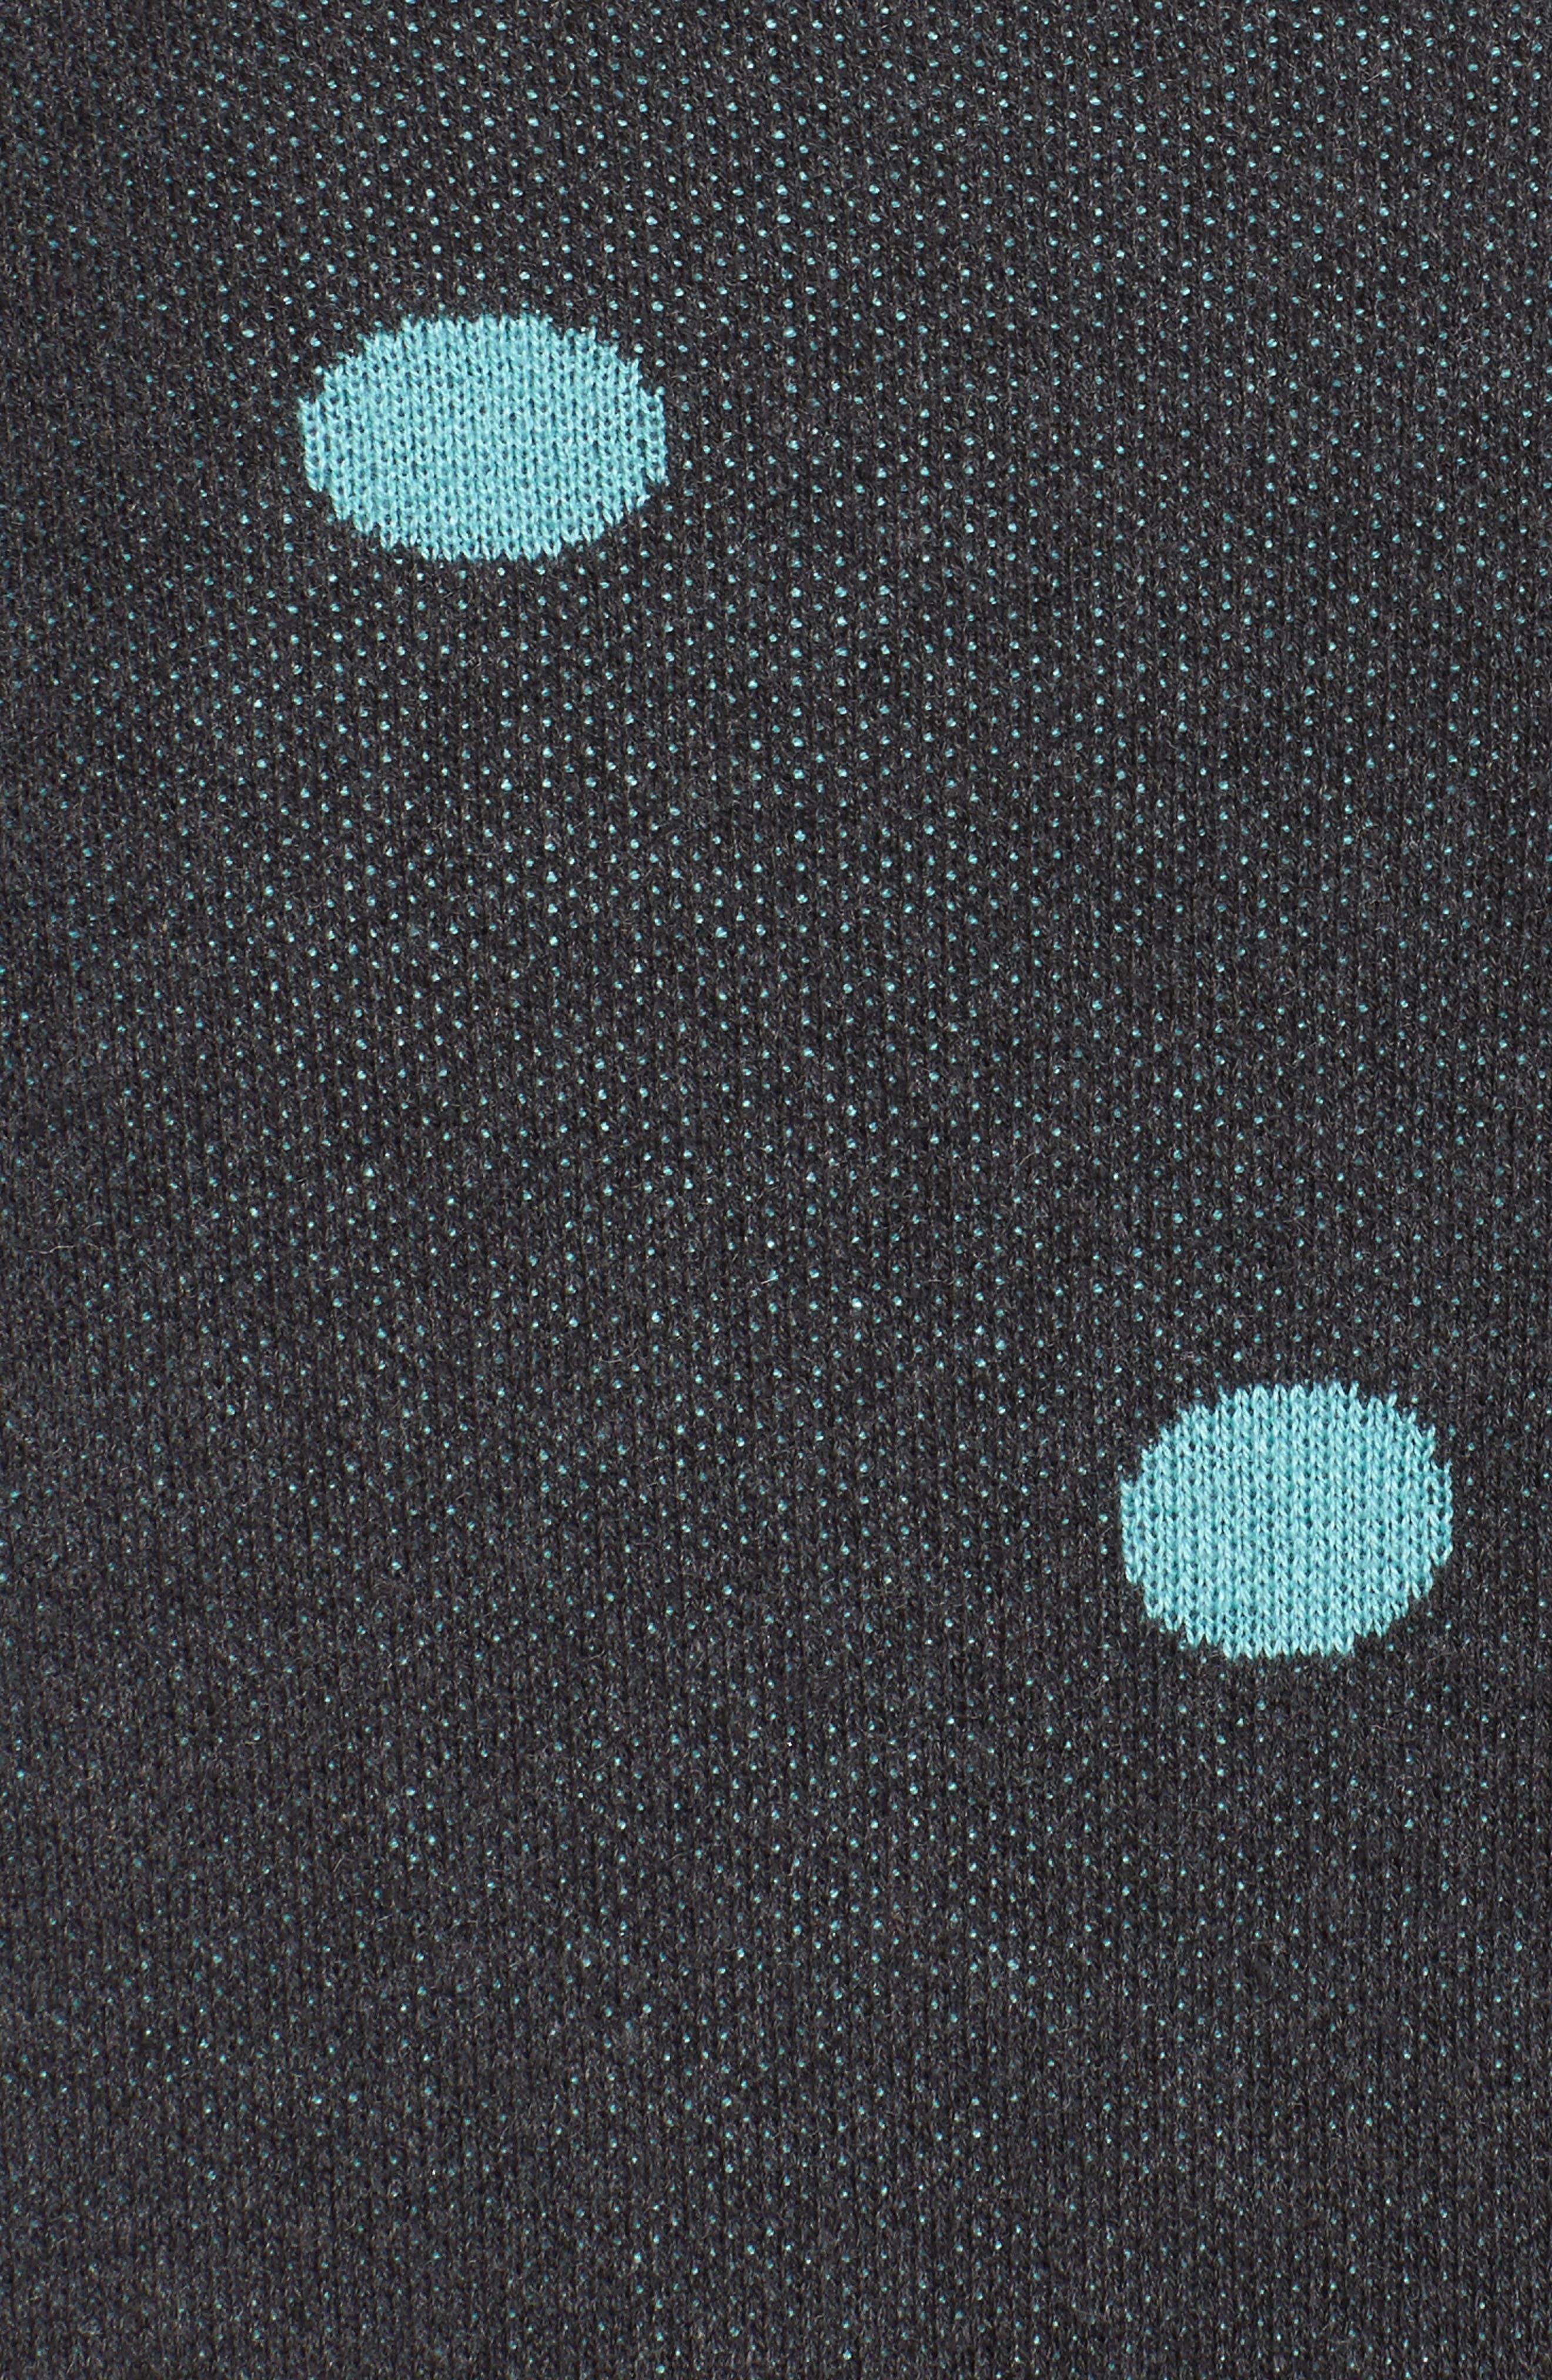 Dolman Sleeve Crewneck Sweater,                             Alternate thumbnail 5, color,                             Grey- Blue Dots Pattern